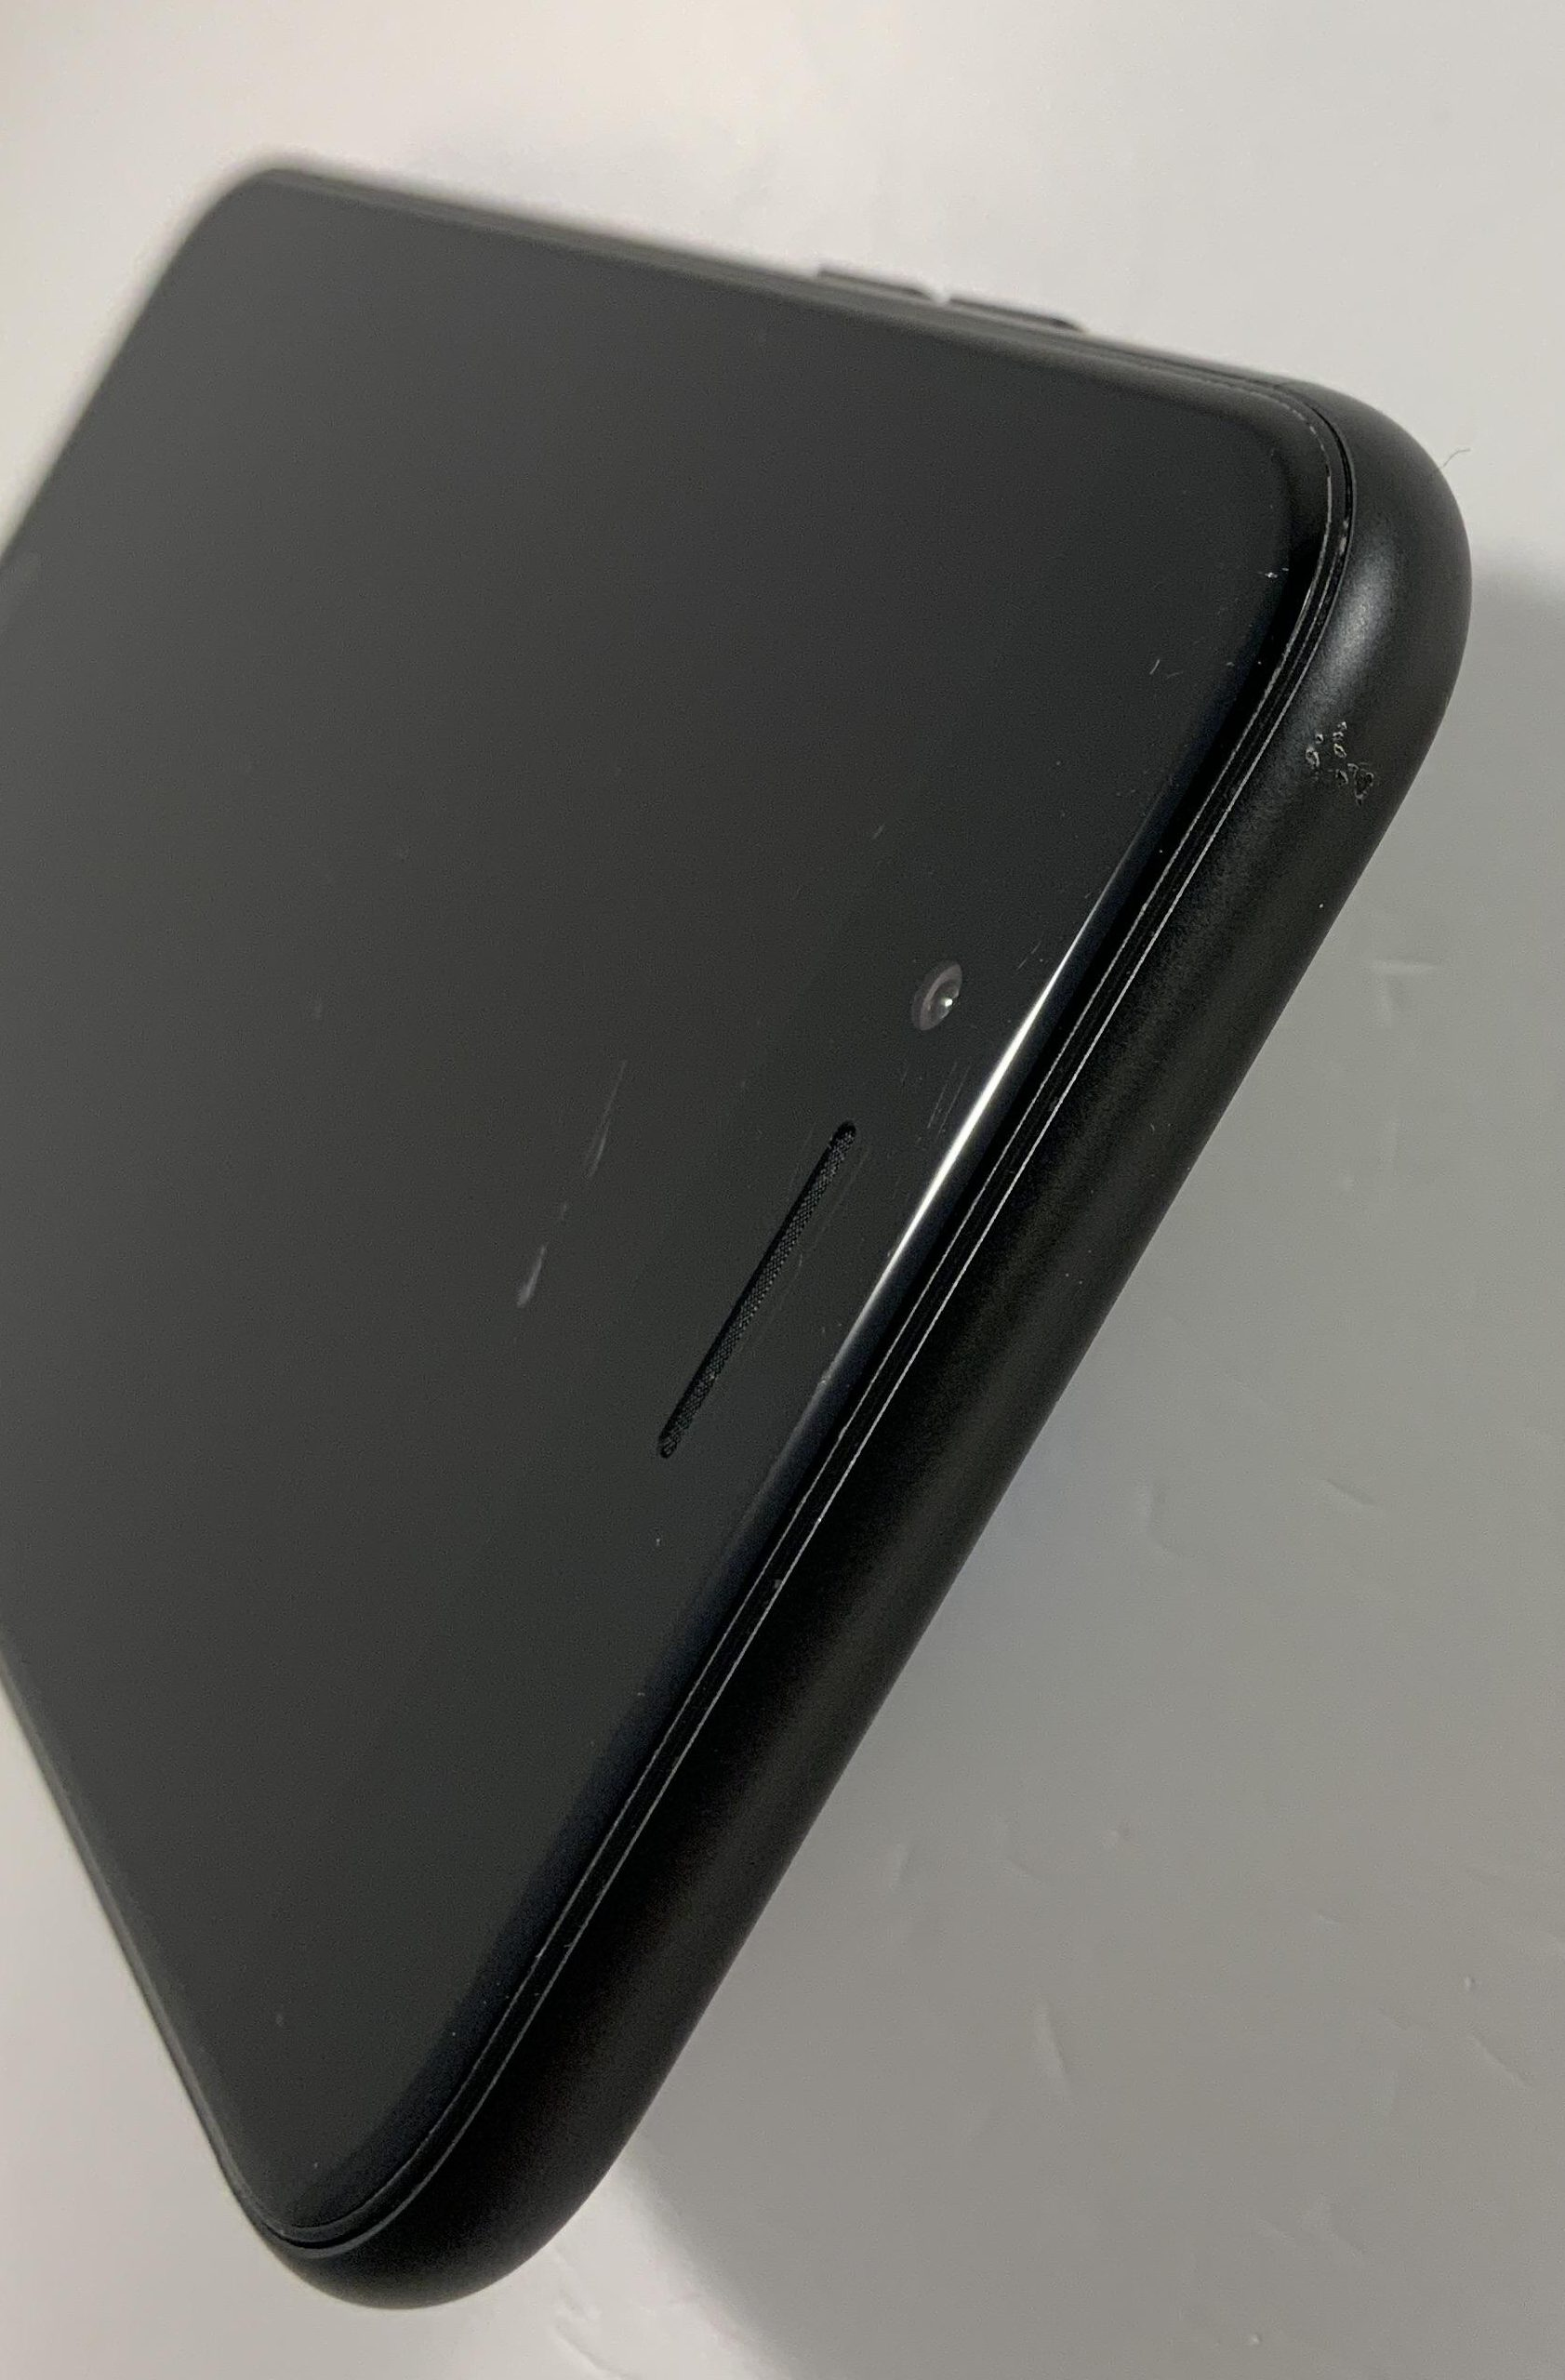 iPhone 7 32GB, 32GB, Black, immagine 4